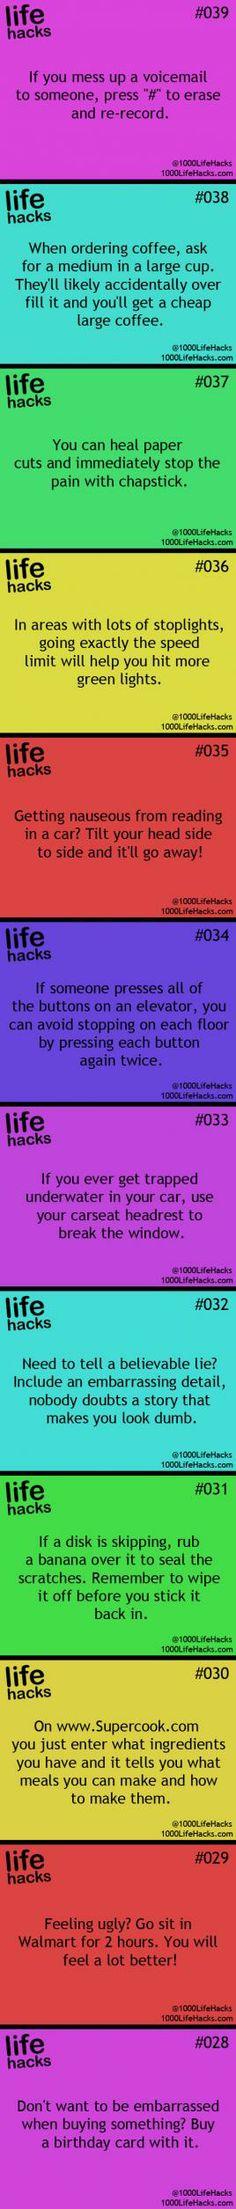 25 Useful Life Hacks | Laugh or GTFO